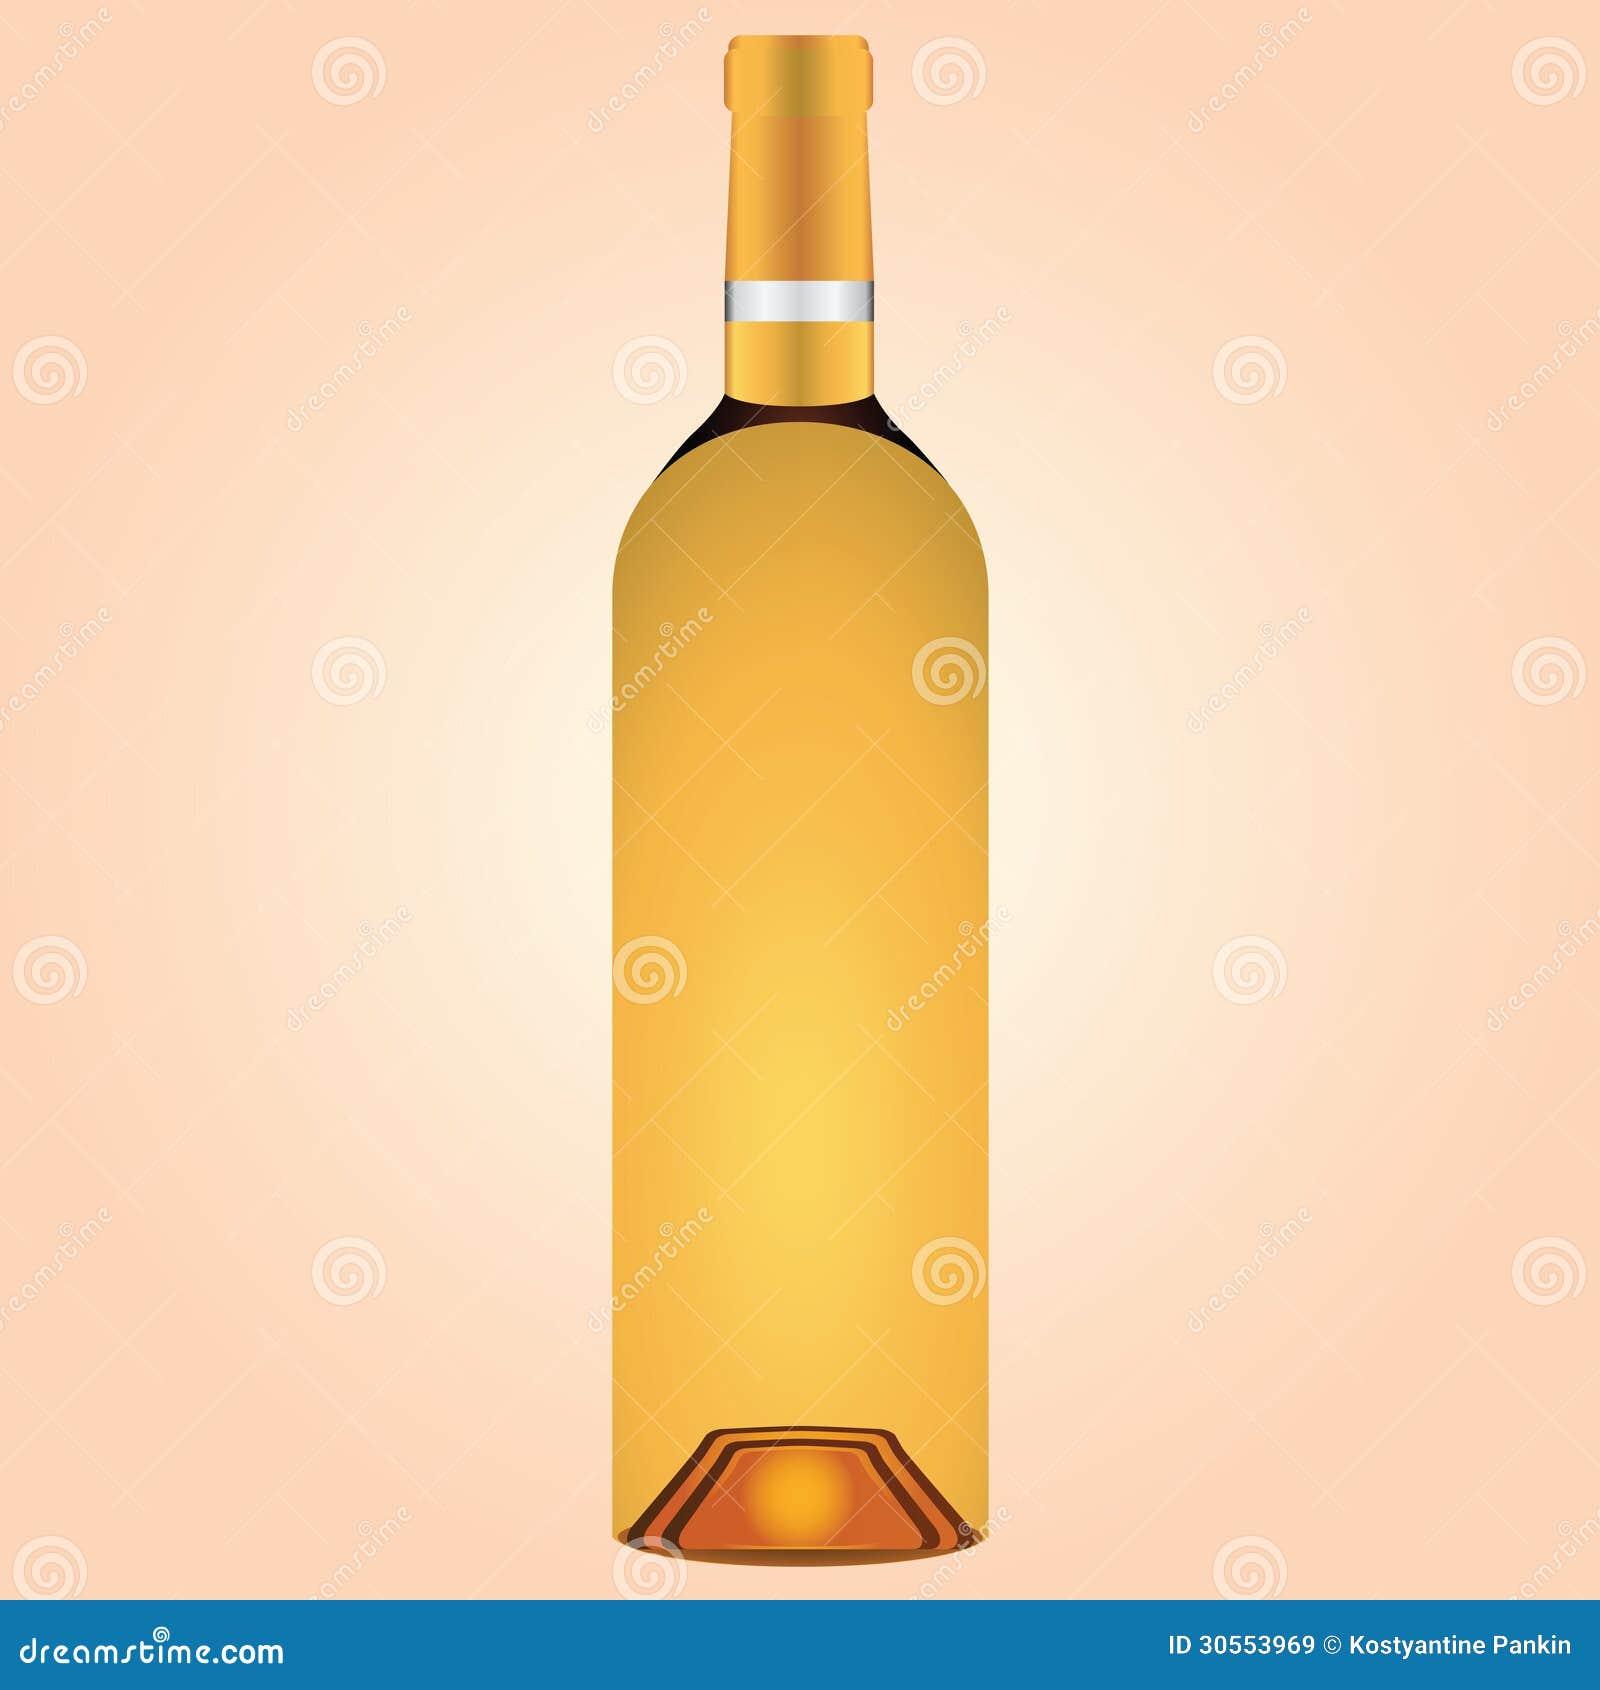 Bottle Of White Wine Royalty Free Stock Images - Image ...